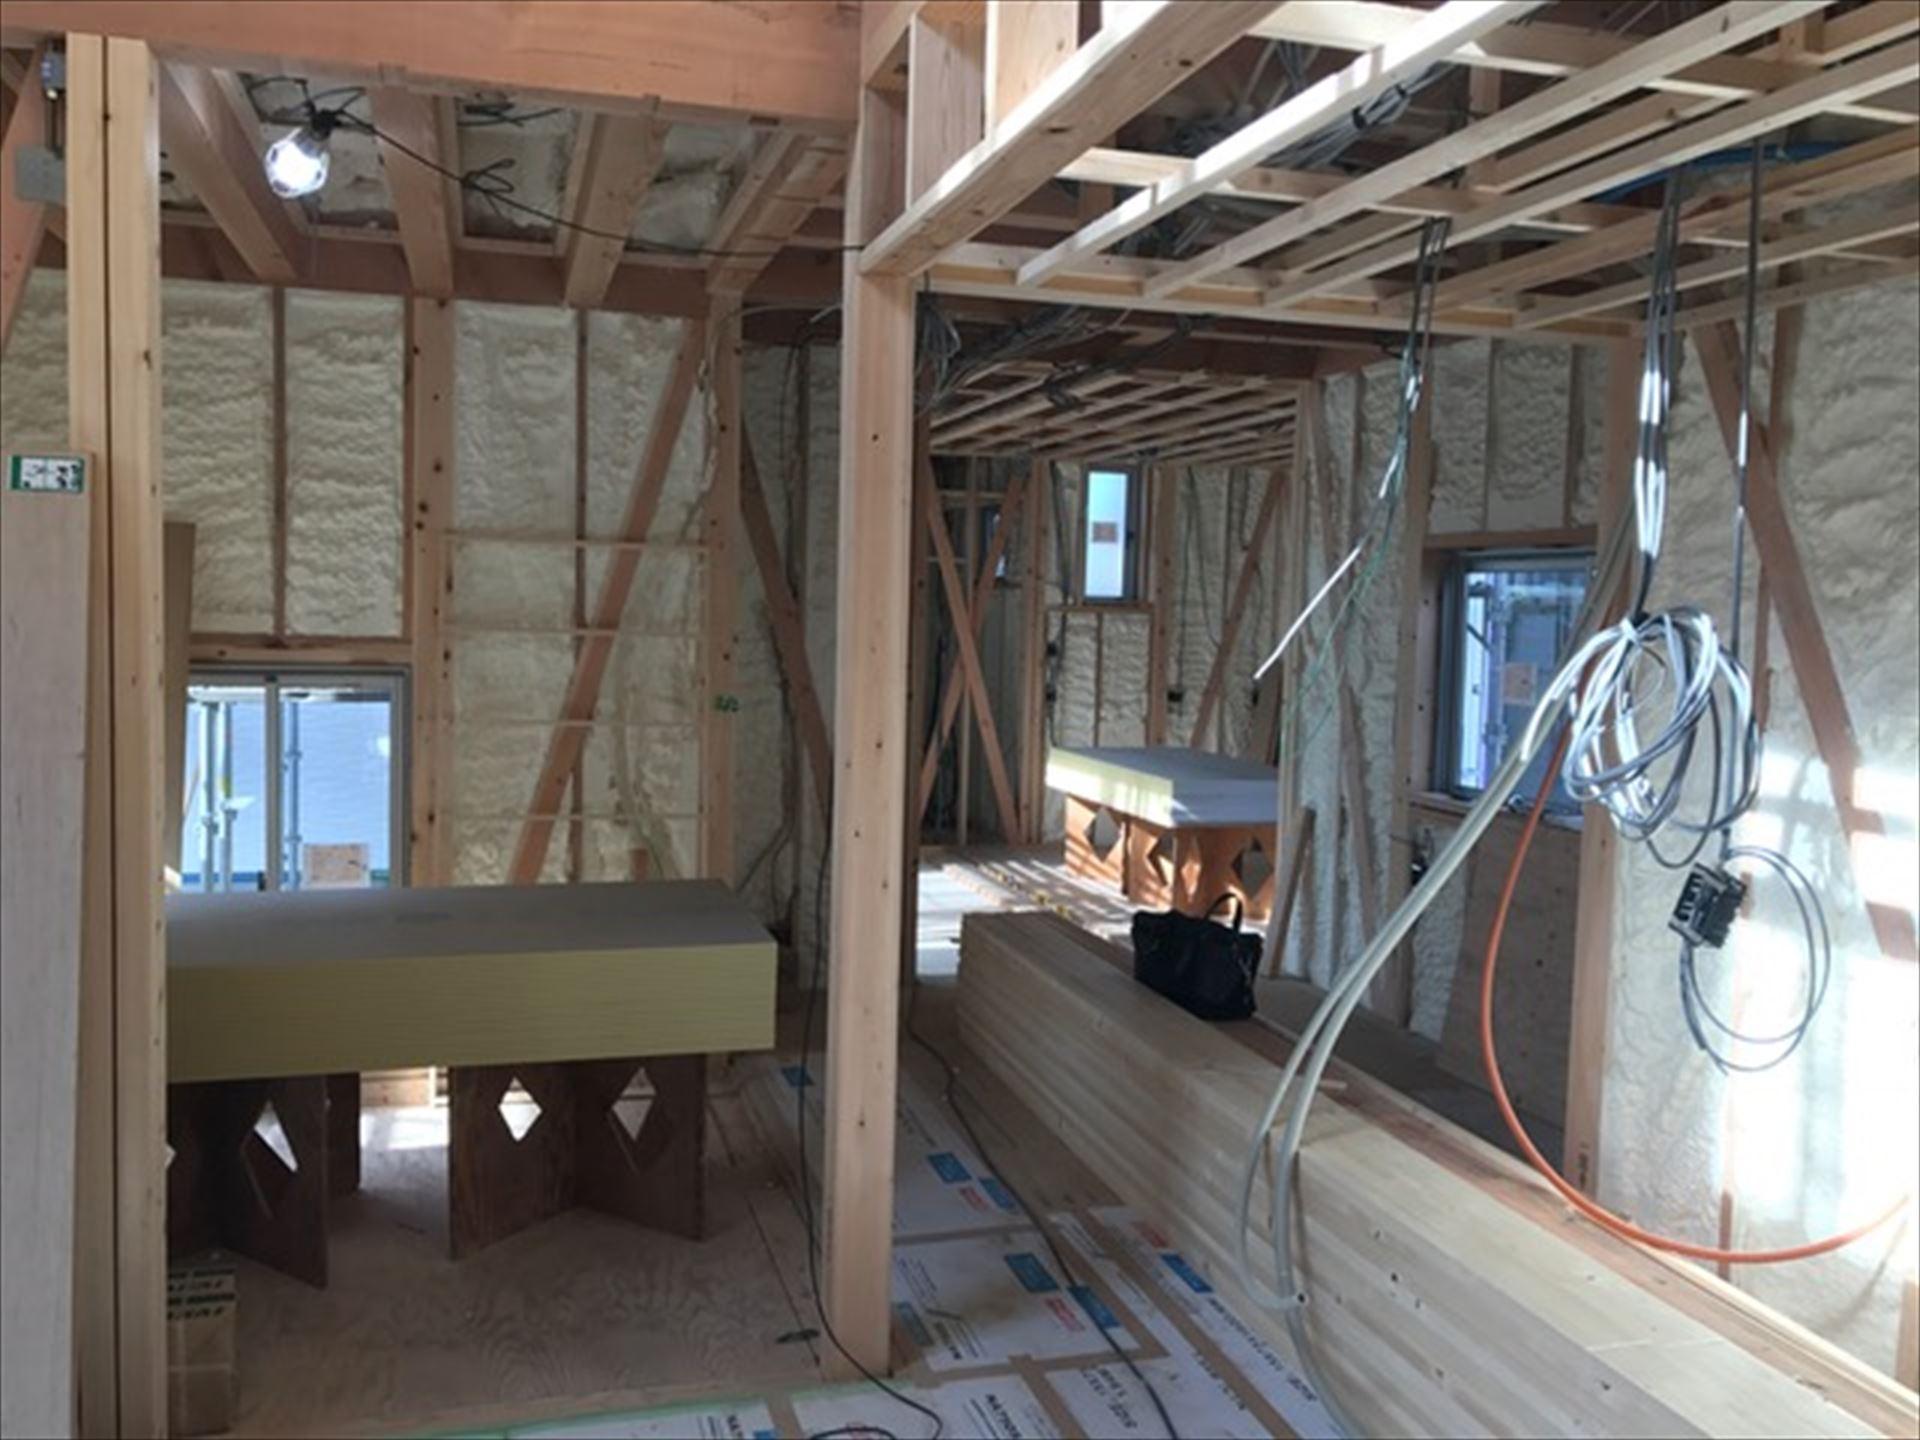 愛知県一宮市 「極楽寺の家」 木の家 現場